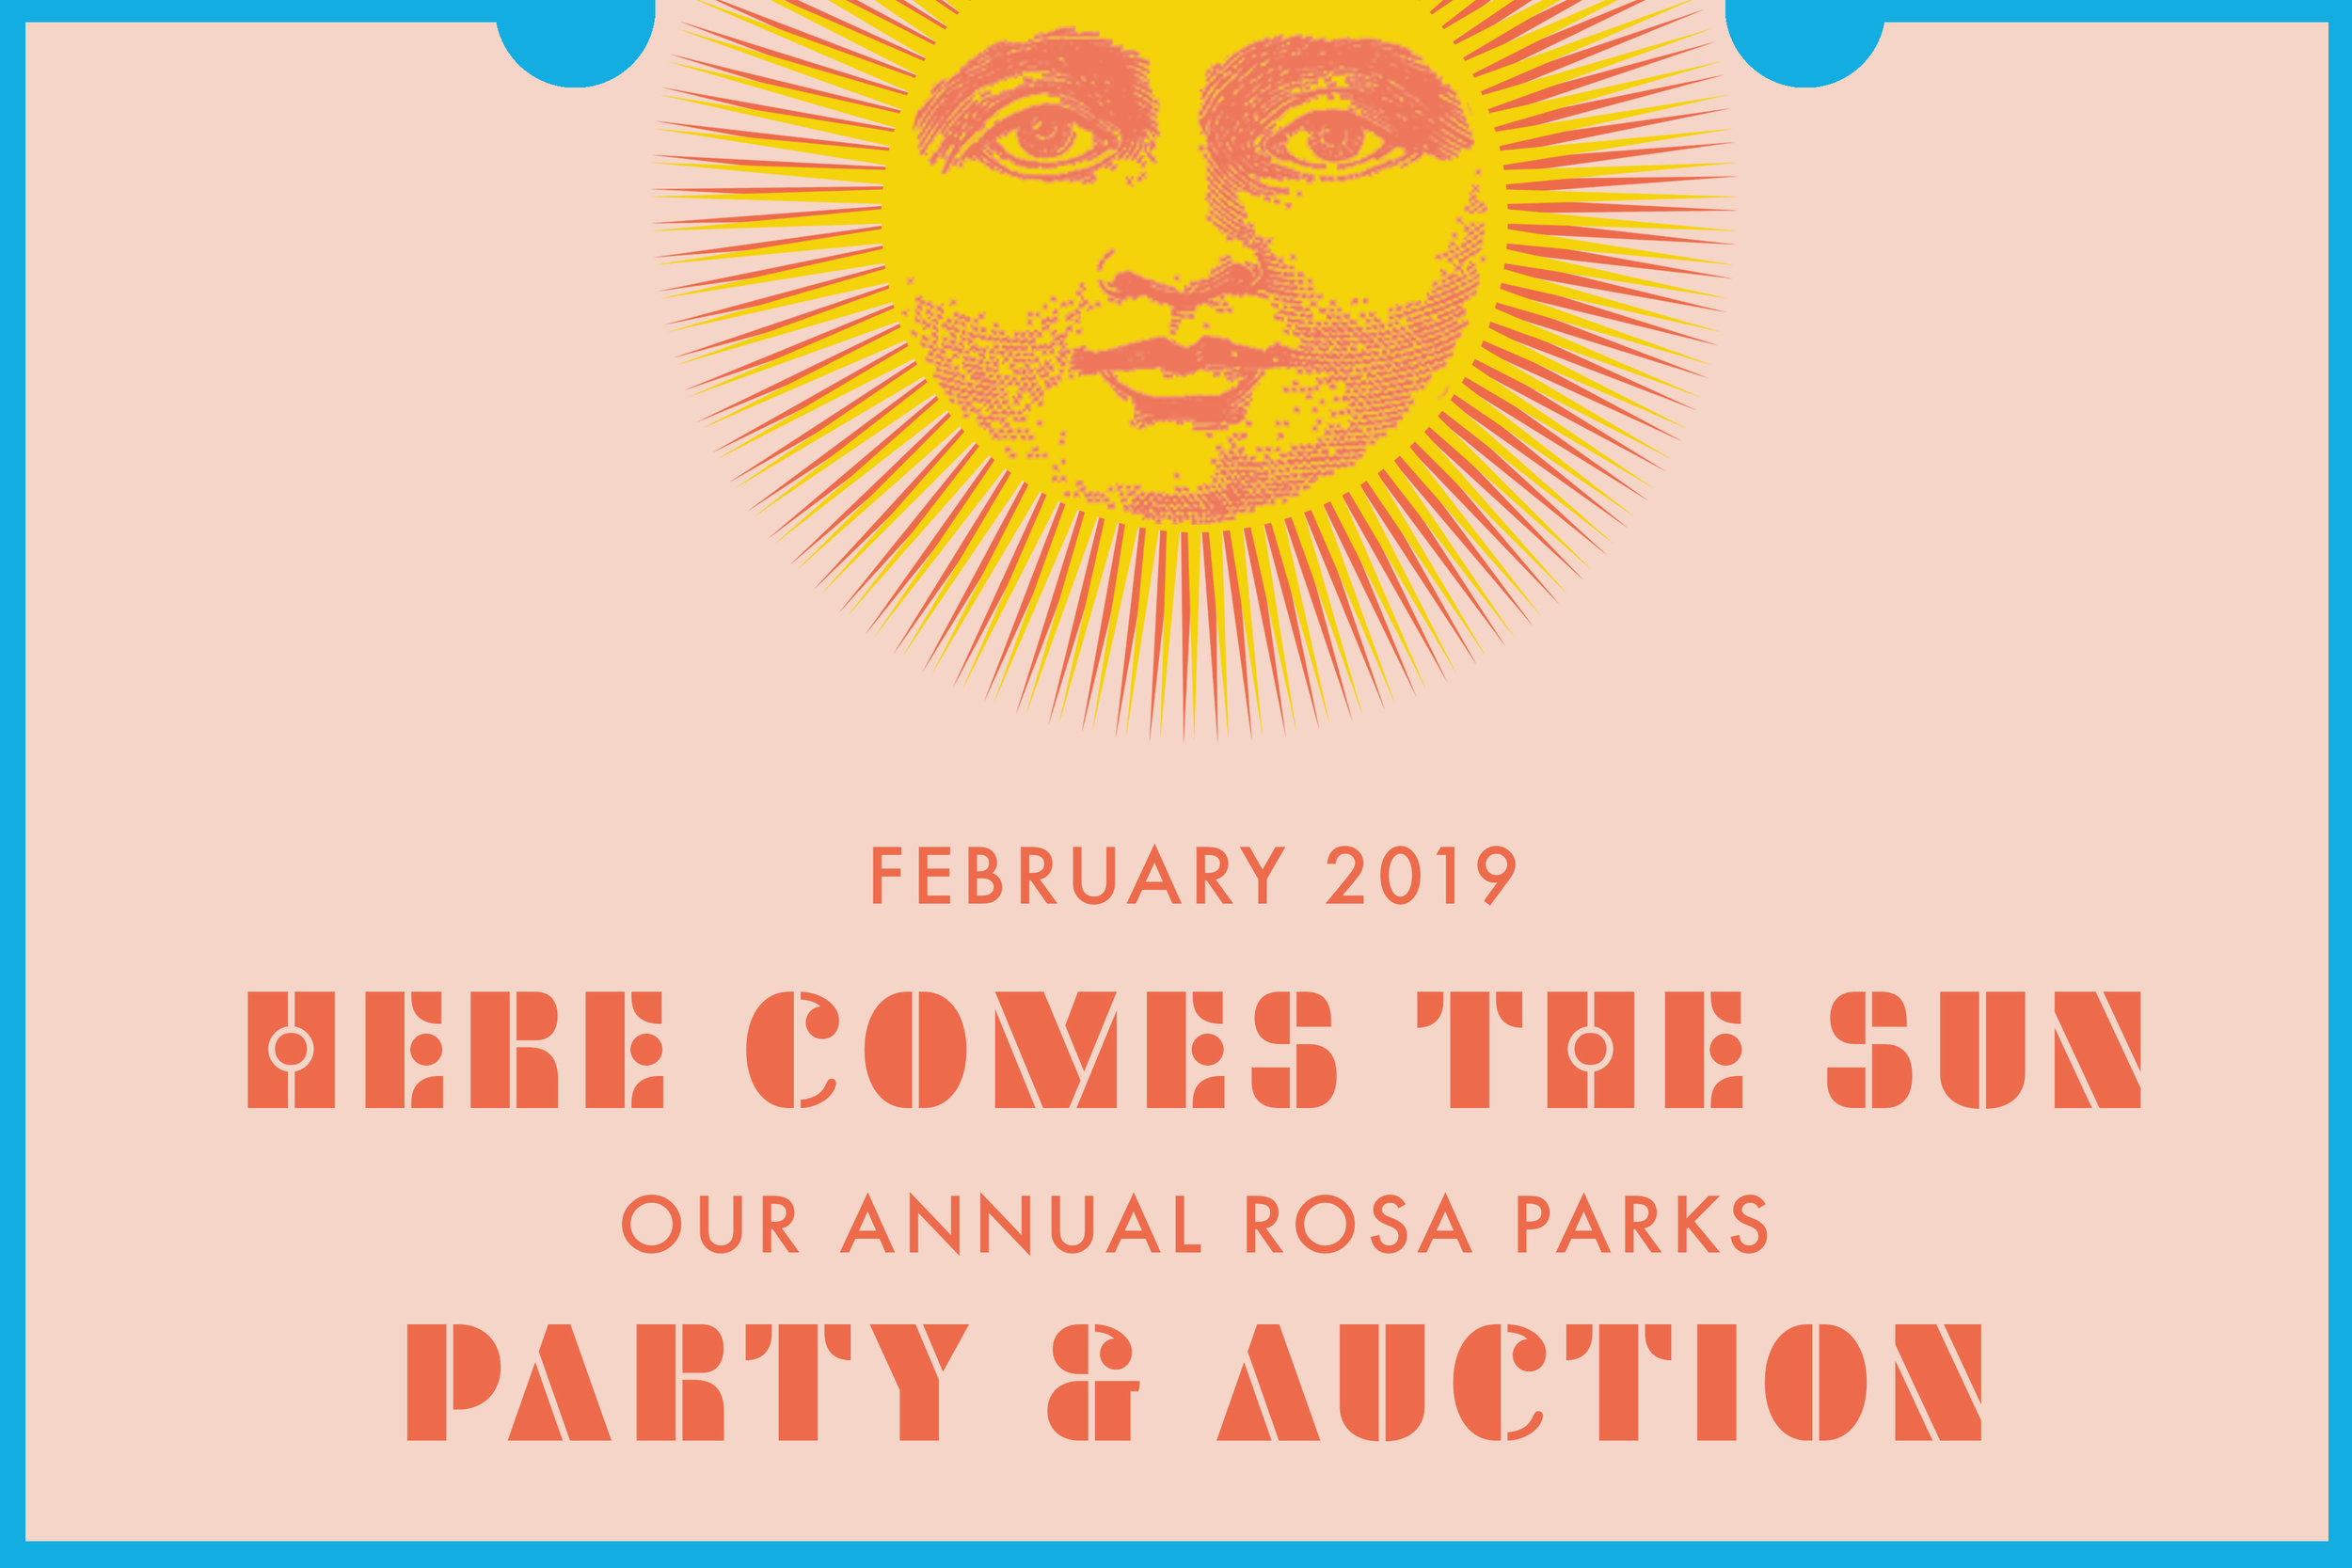 WE HOPE YOU  HAD FUN! - When: February 2, 2019Where: Ed Roberts Campus3075 Adeline St. Berkeleyhttps://www.edrobertscampus.org/